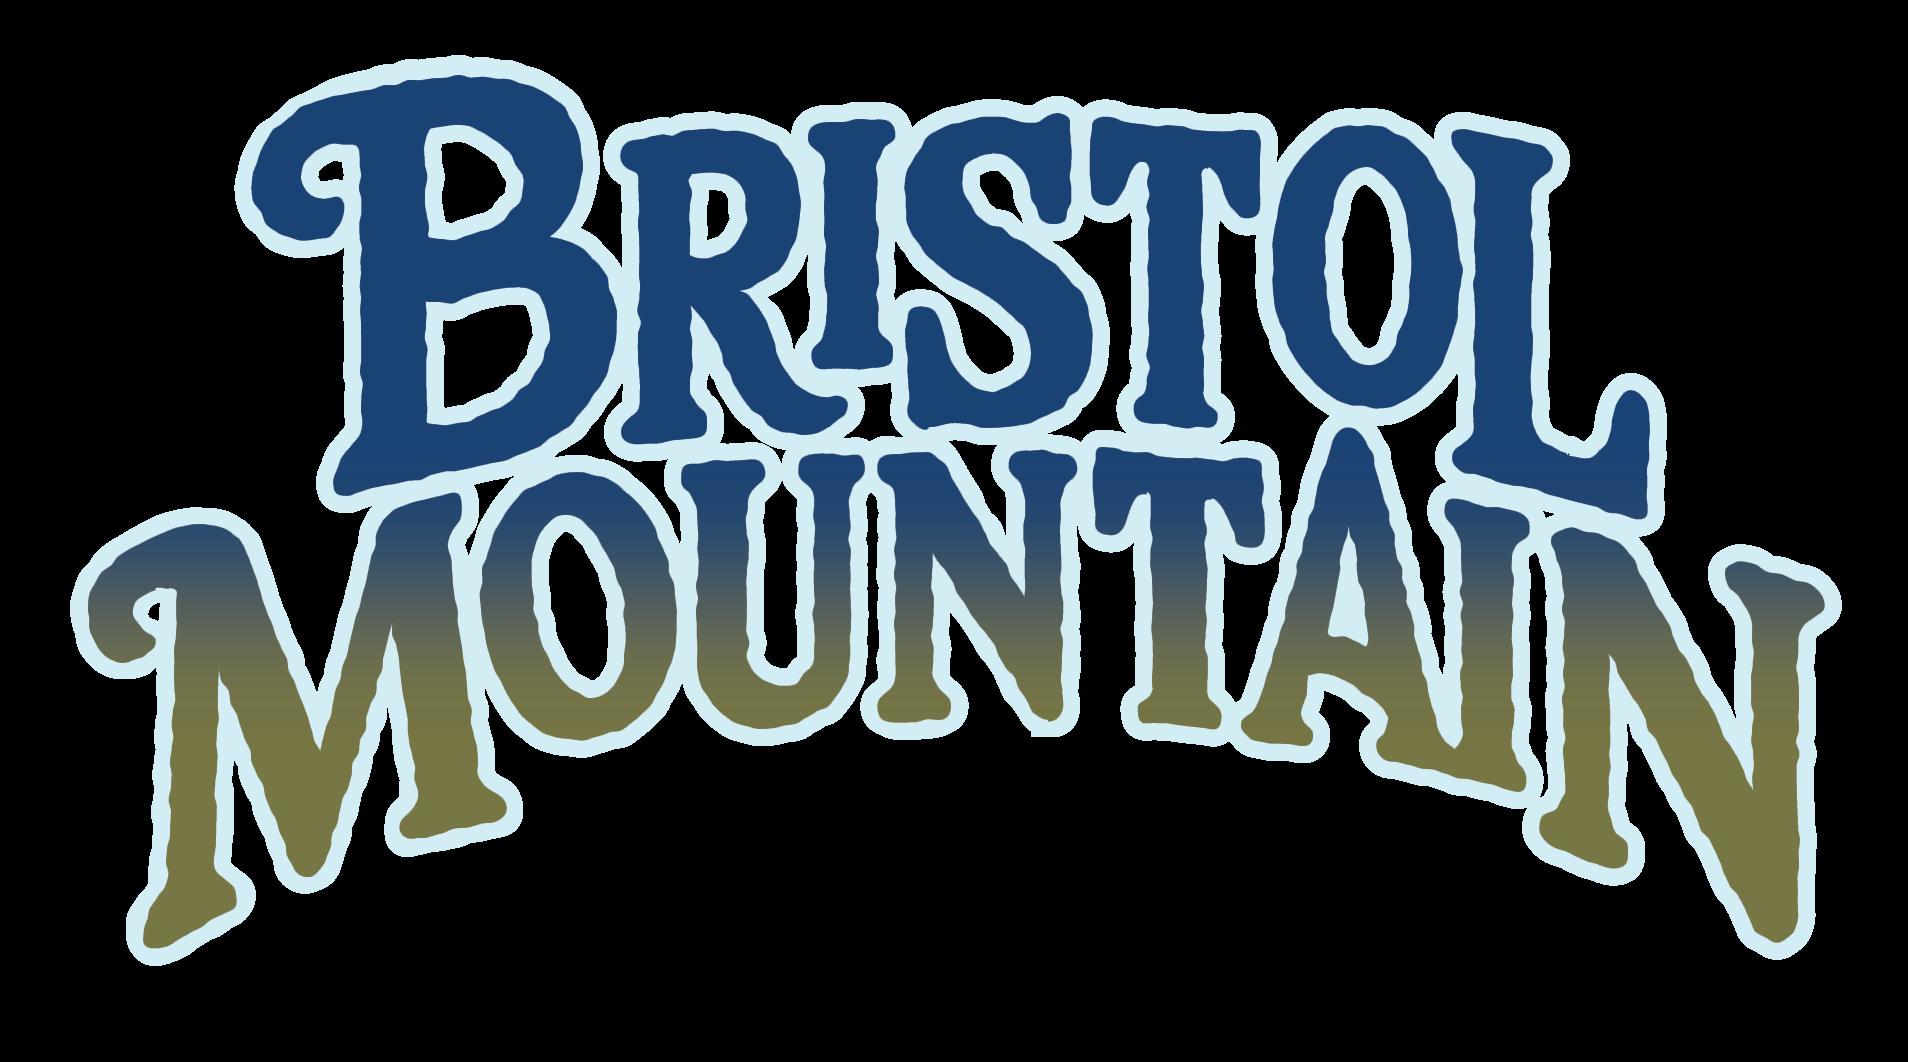 Bristol Mountain, Canadaigua, Event Venue, Dream Wedding Expo, Livingston County Chamber of Commerce & Tourism